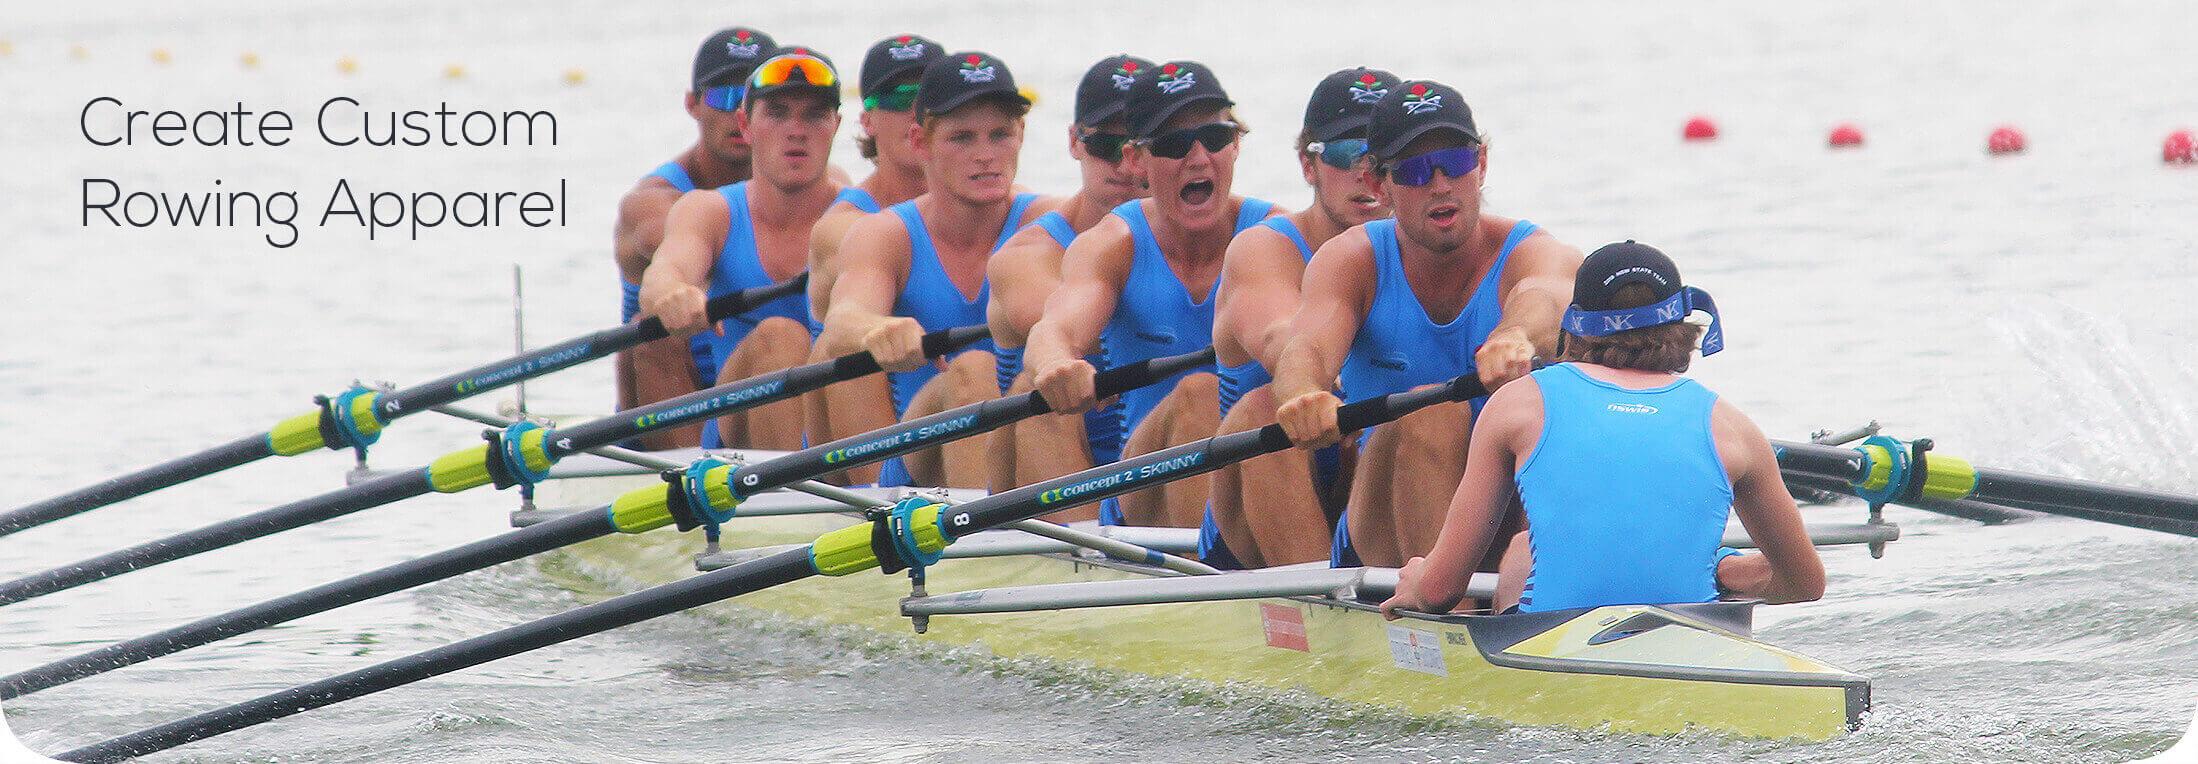 Rowing crew winning a race